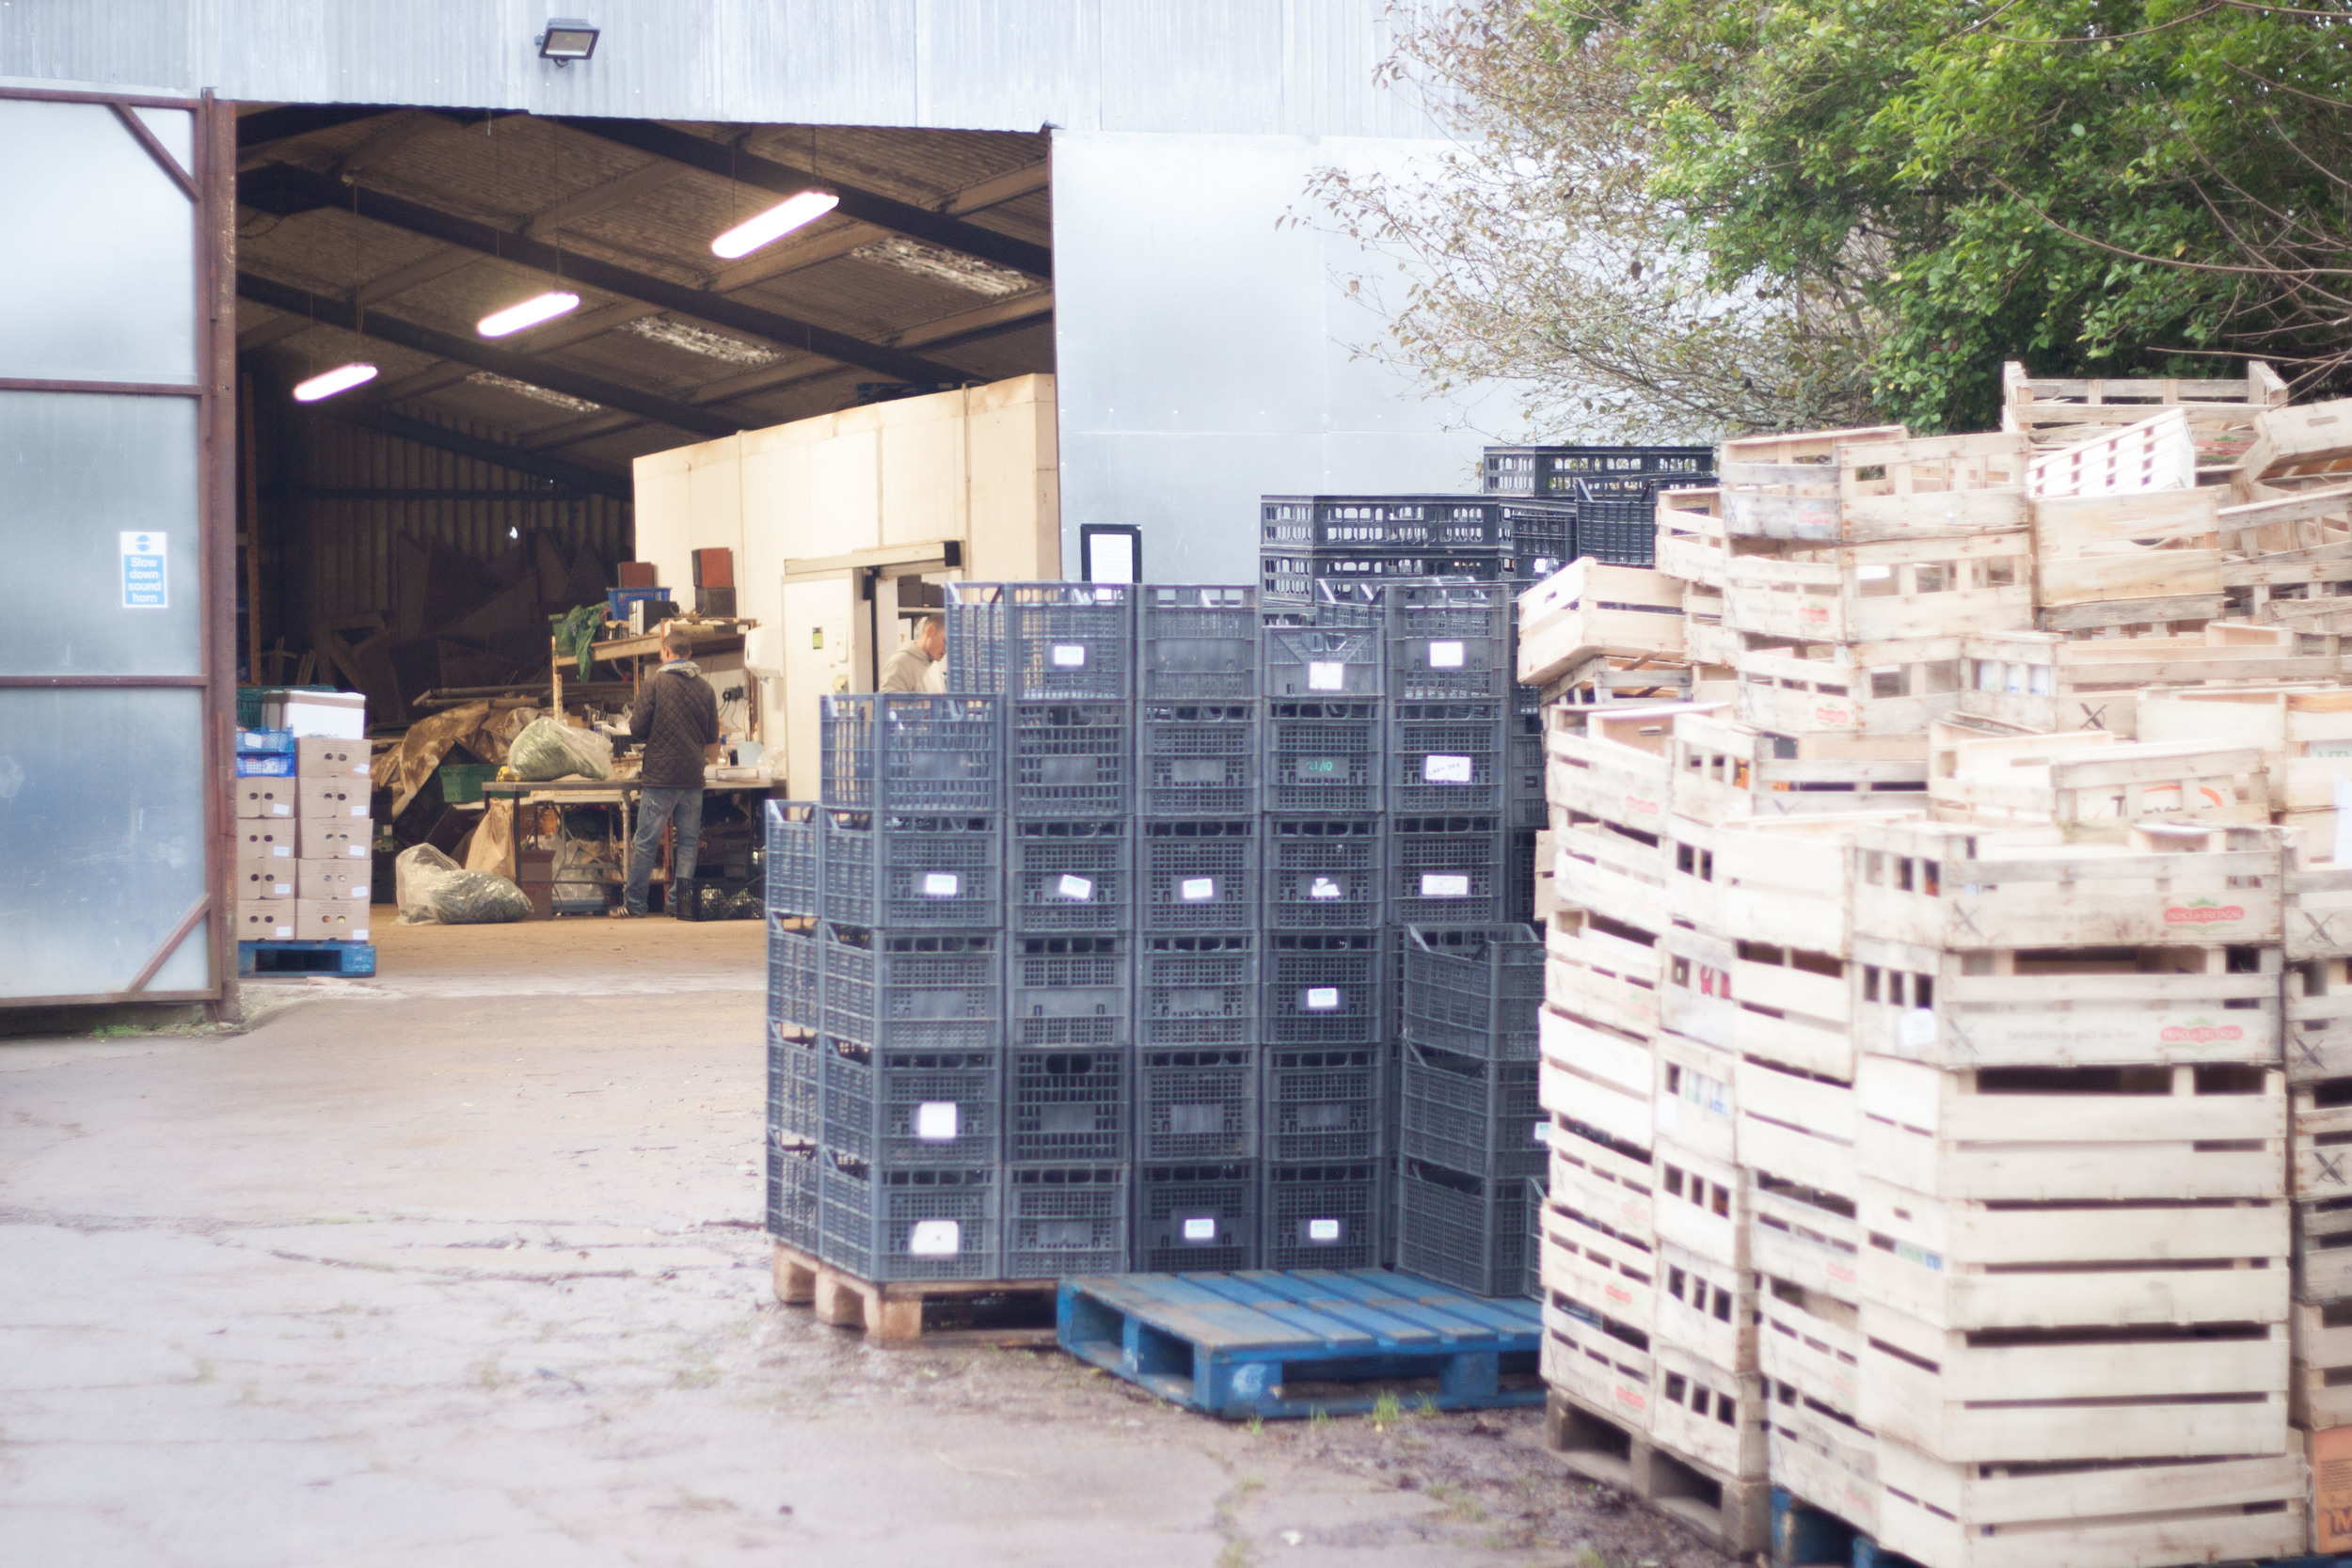 community_farm_crates